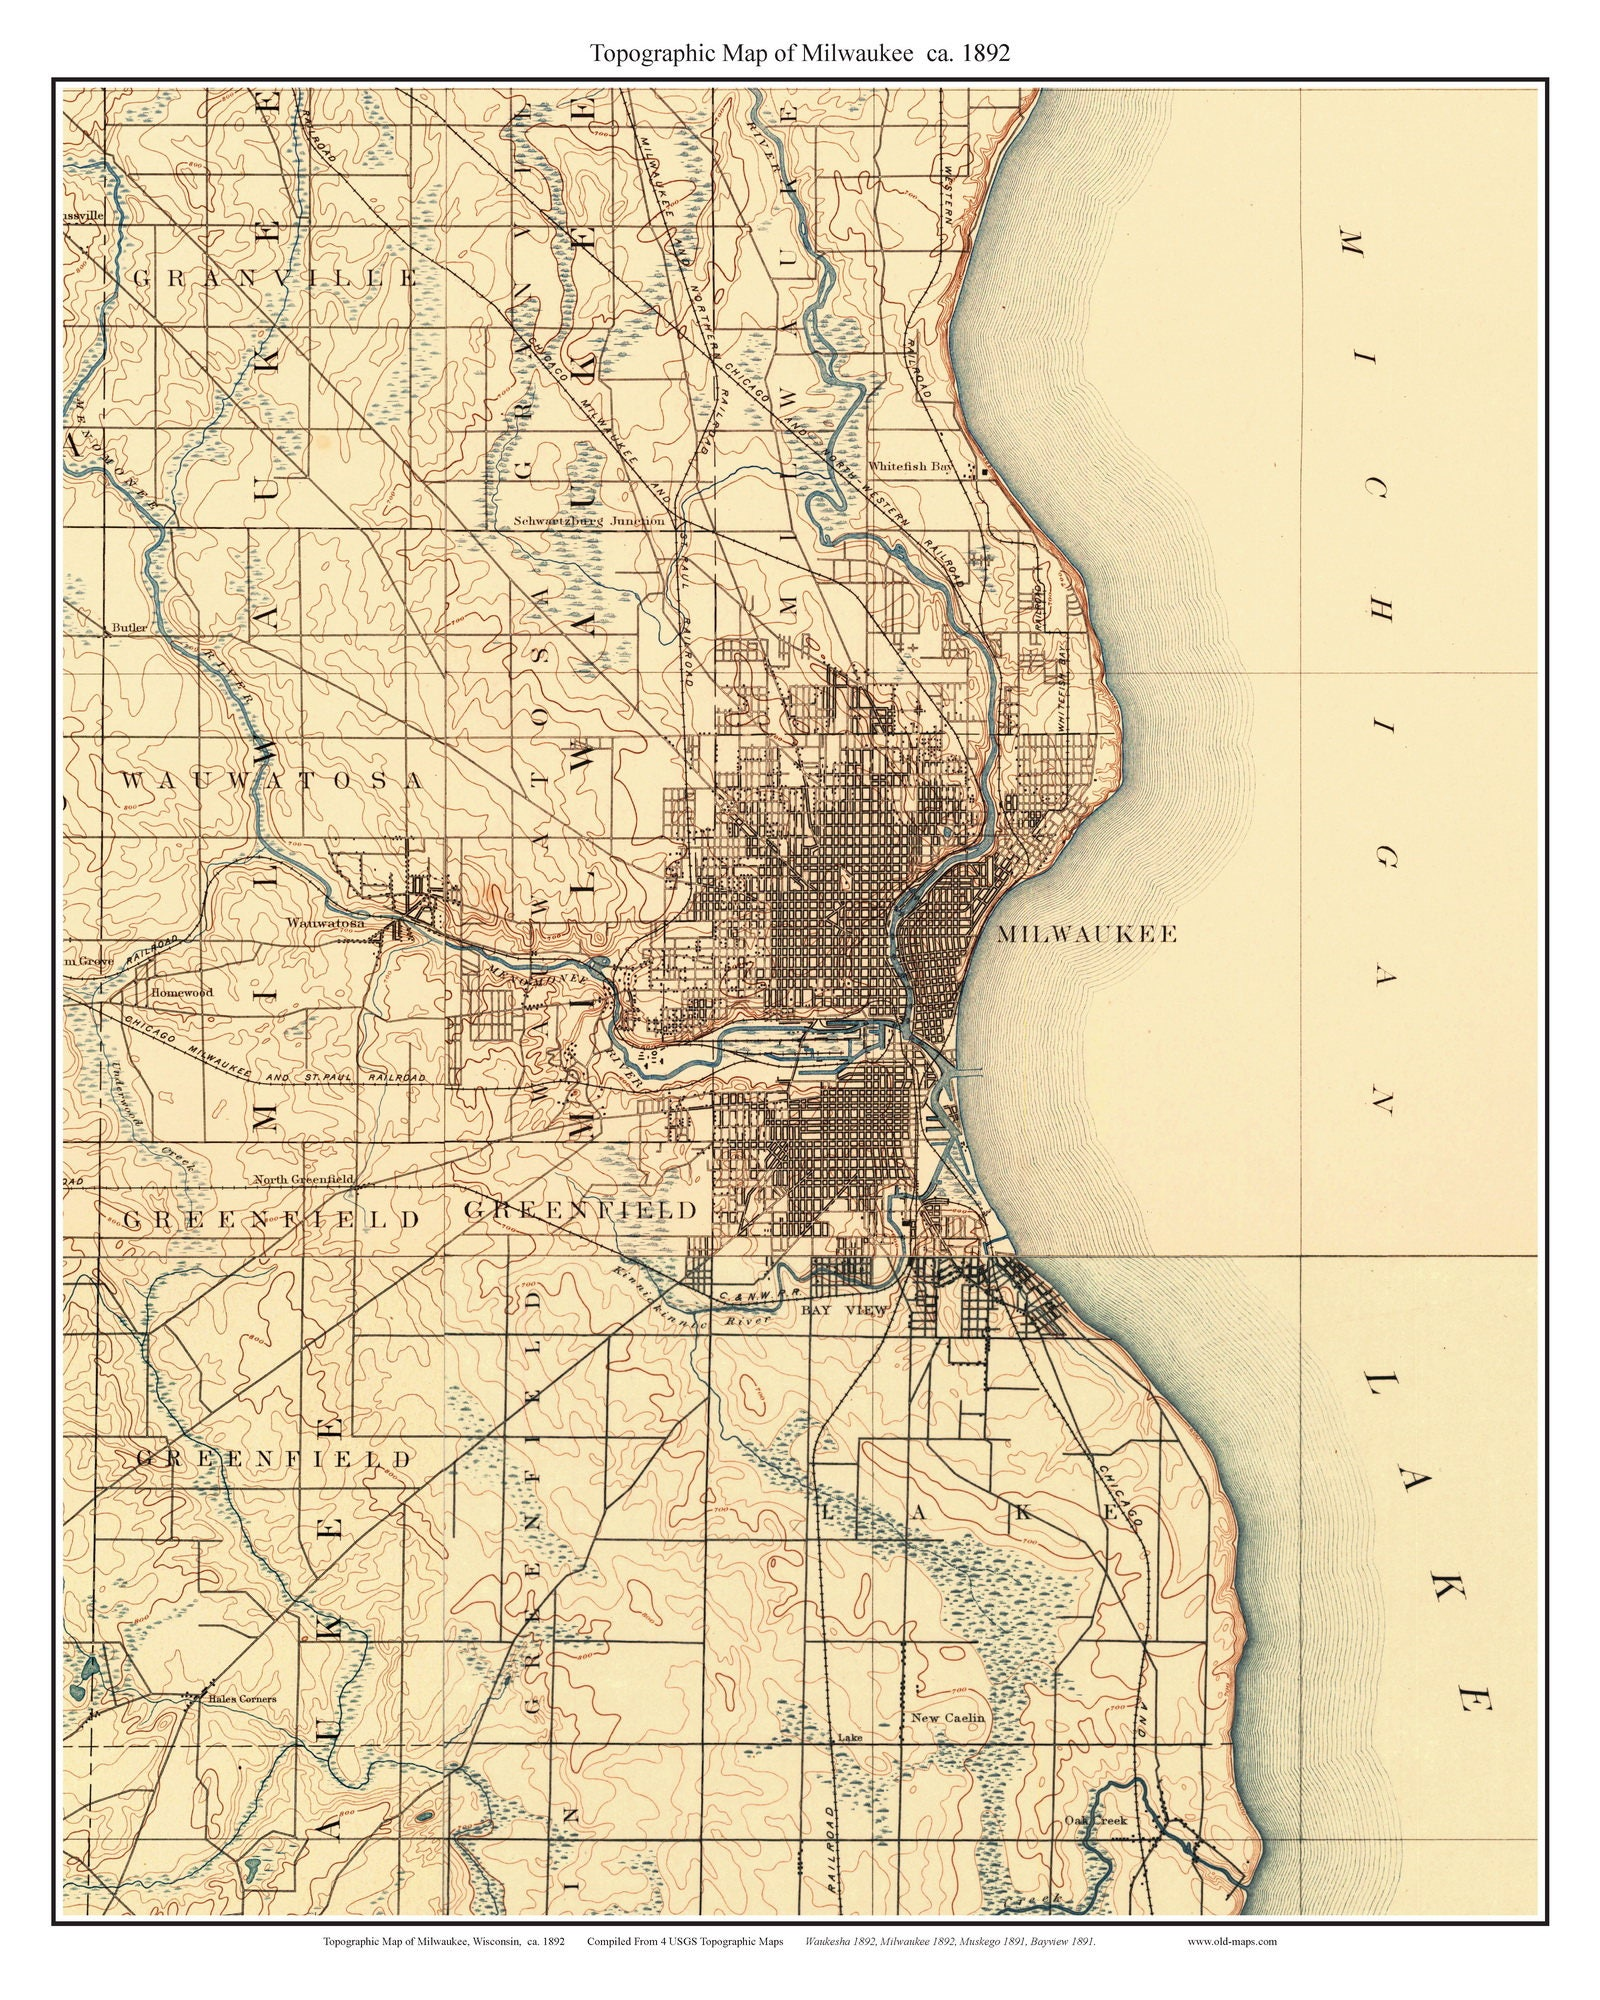 Milwaukee Ca 1892 Usgs Old Topographic Map Custom Etsy